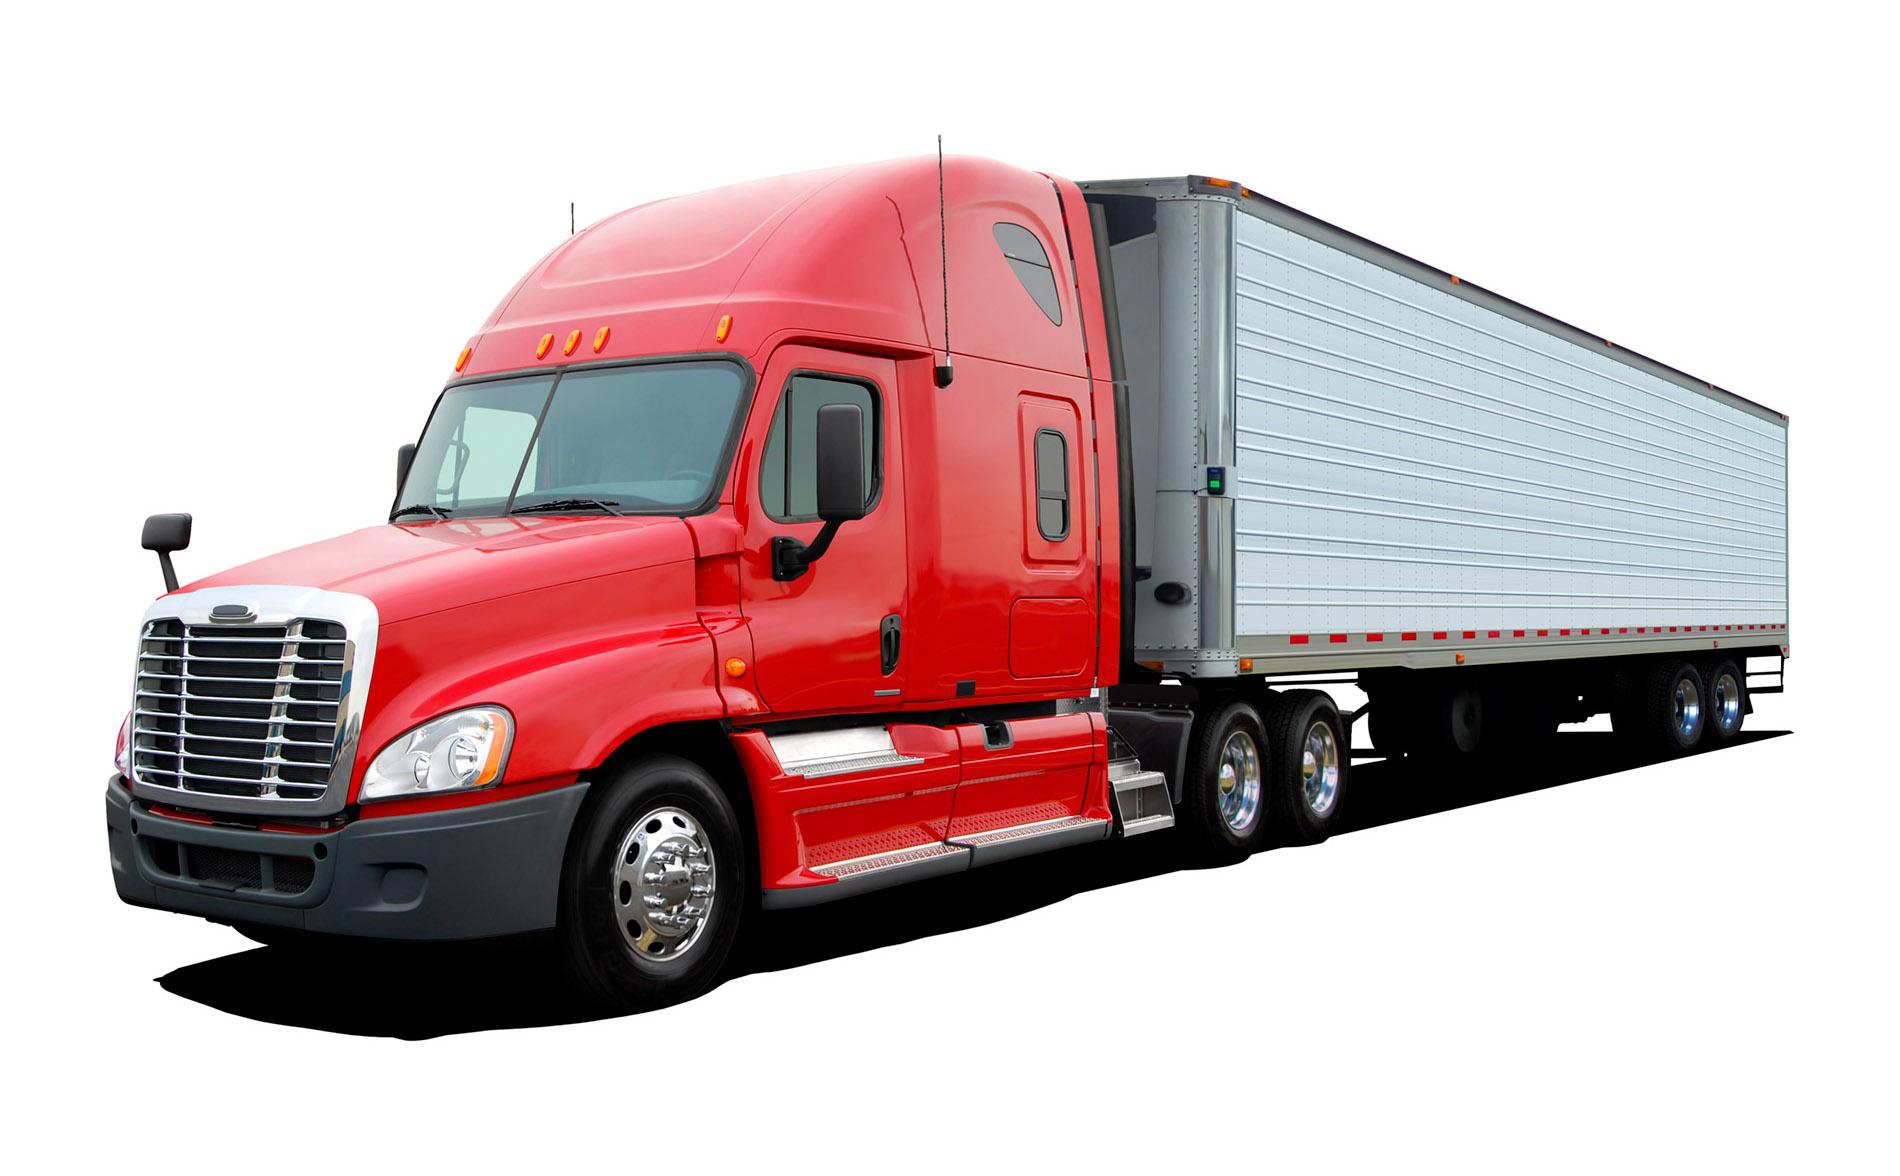 Trucking Insurance Long haul truckers